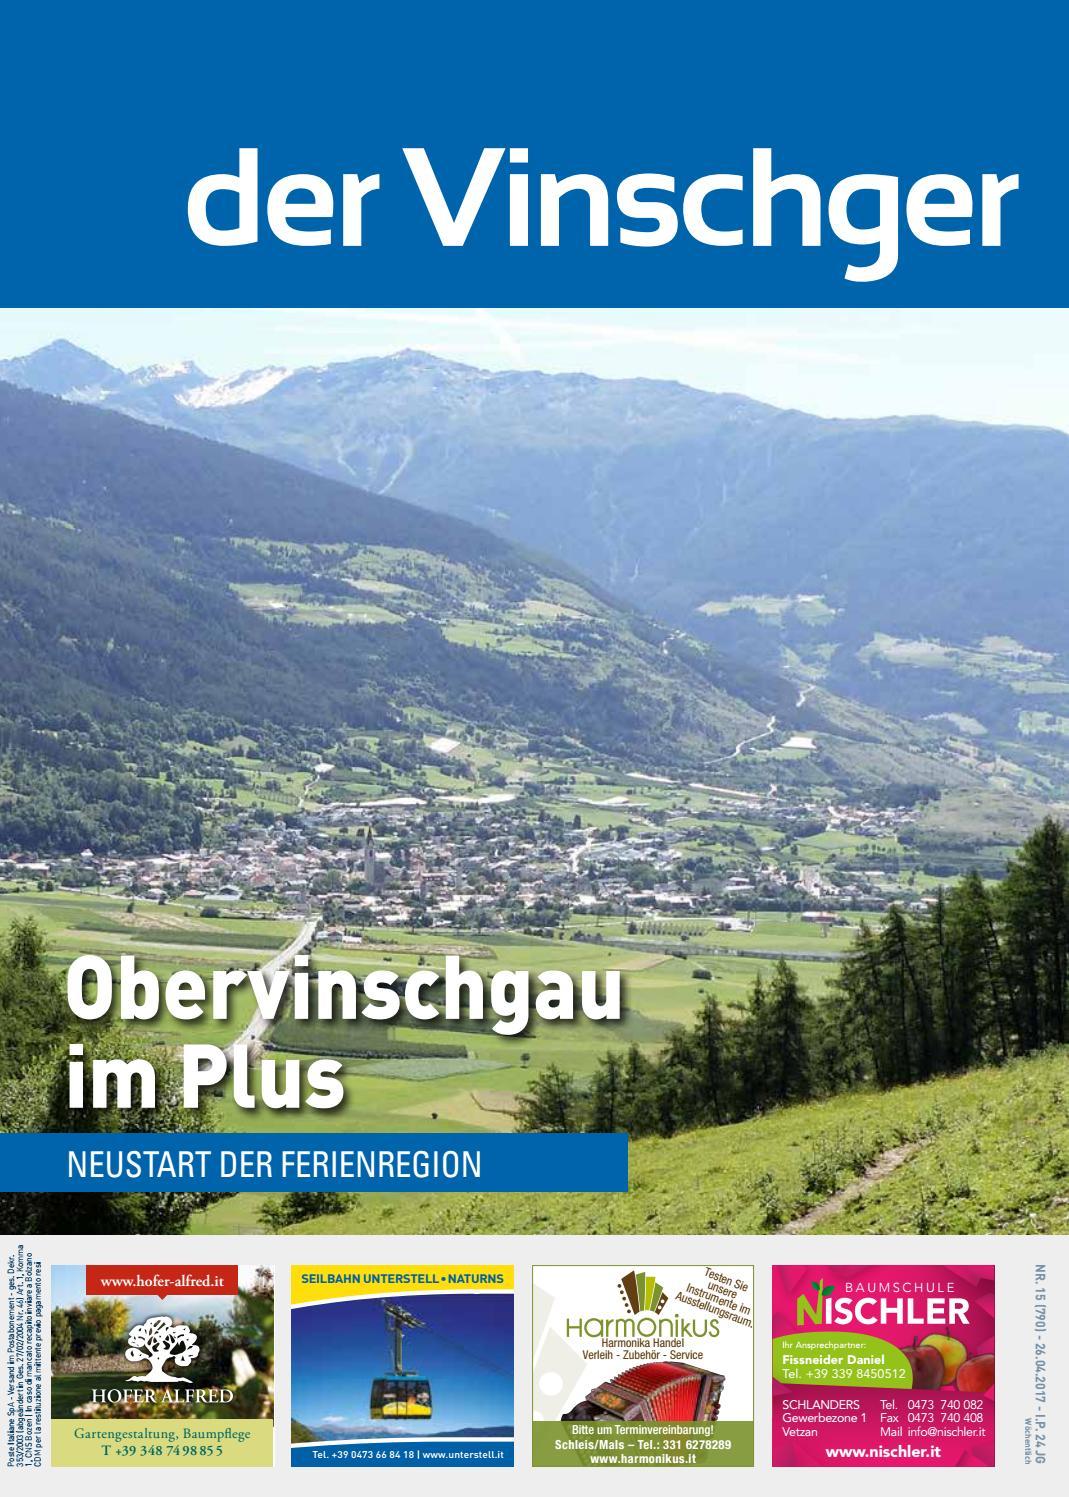 Obervinschgau Im Plus By Pilolycom Gmbh Issuu